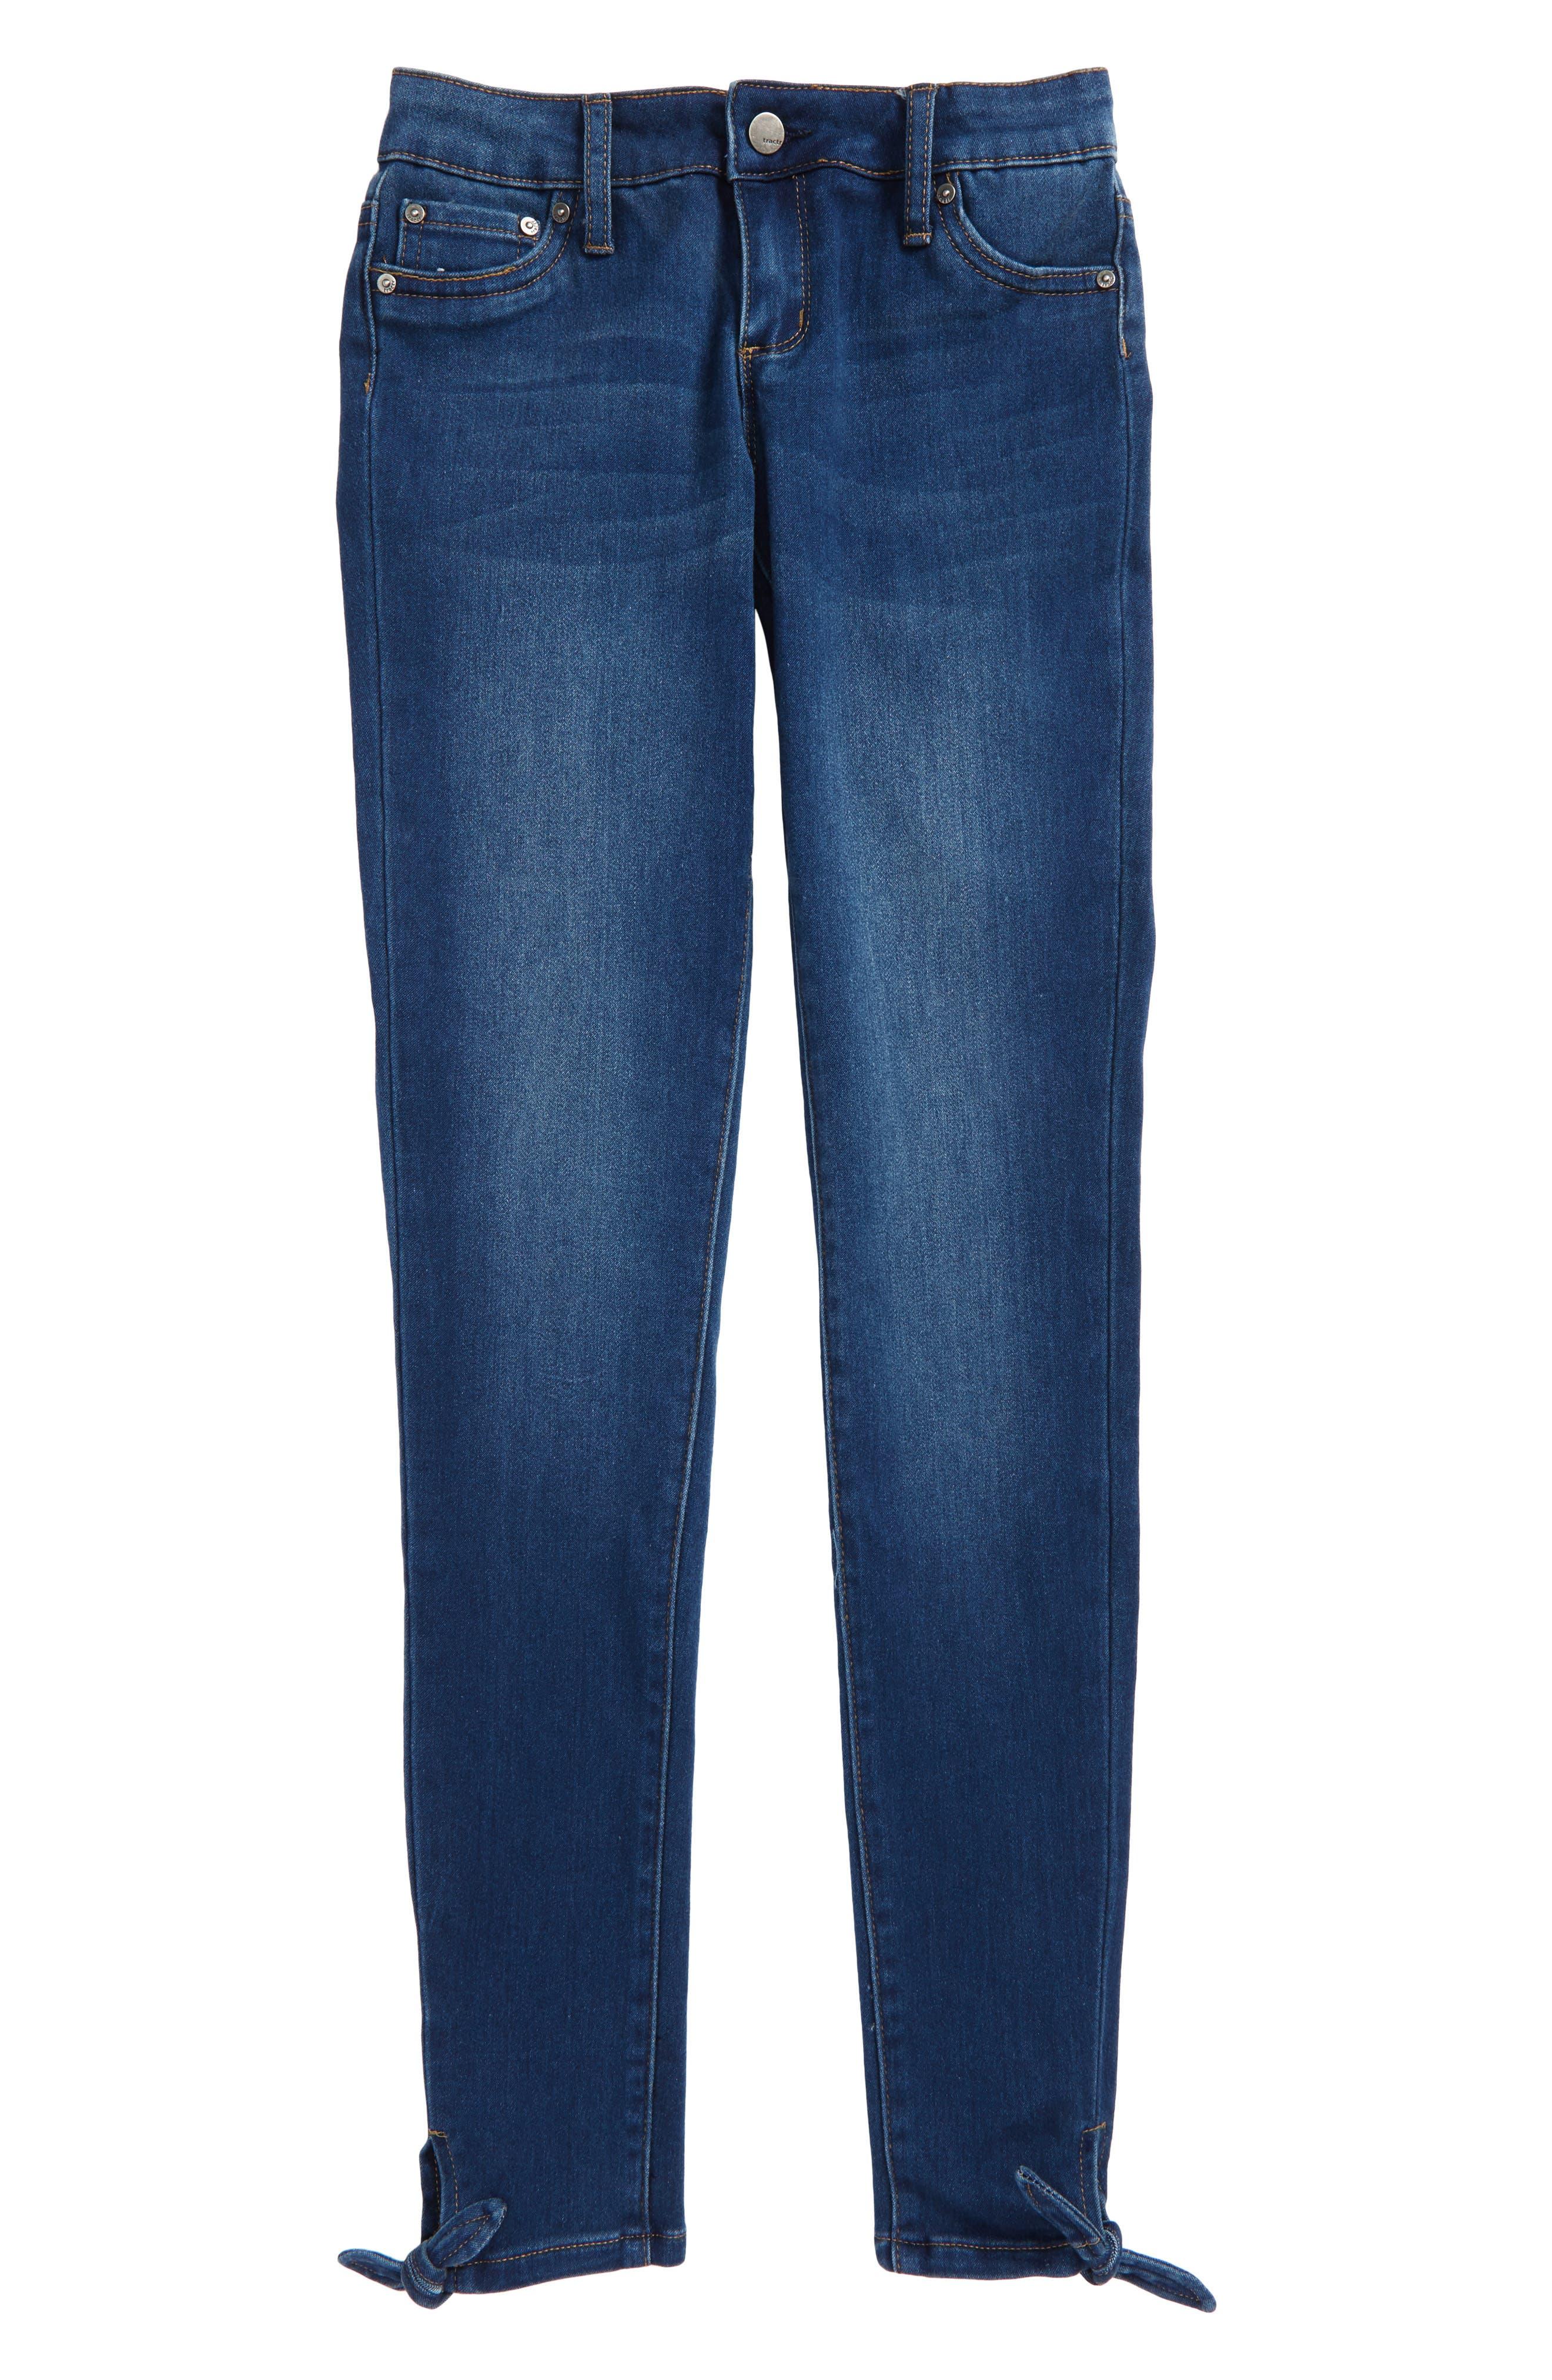 Ankle Tie Skinny Jeans,                         Main,                         color, Indigo